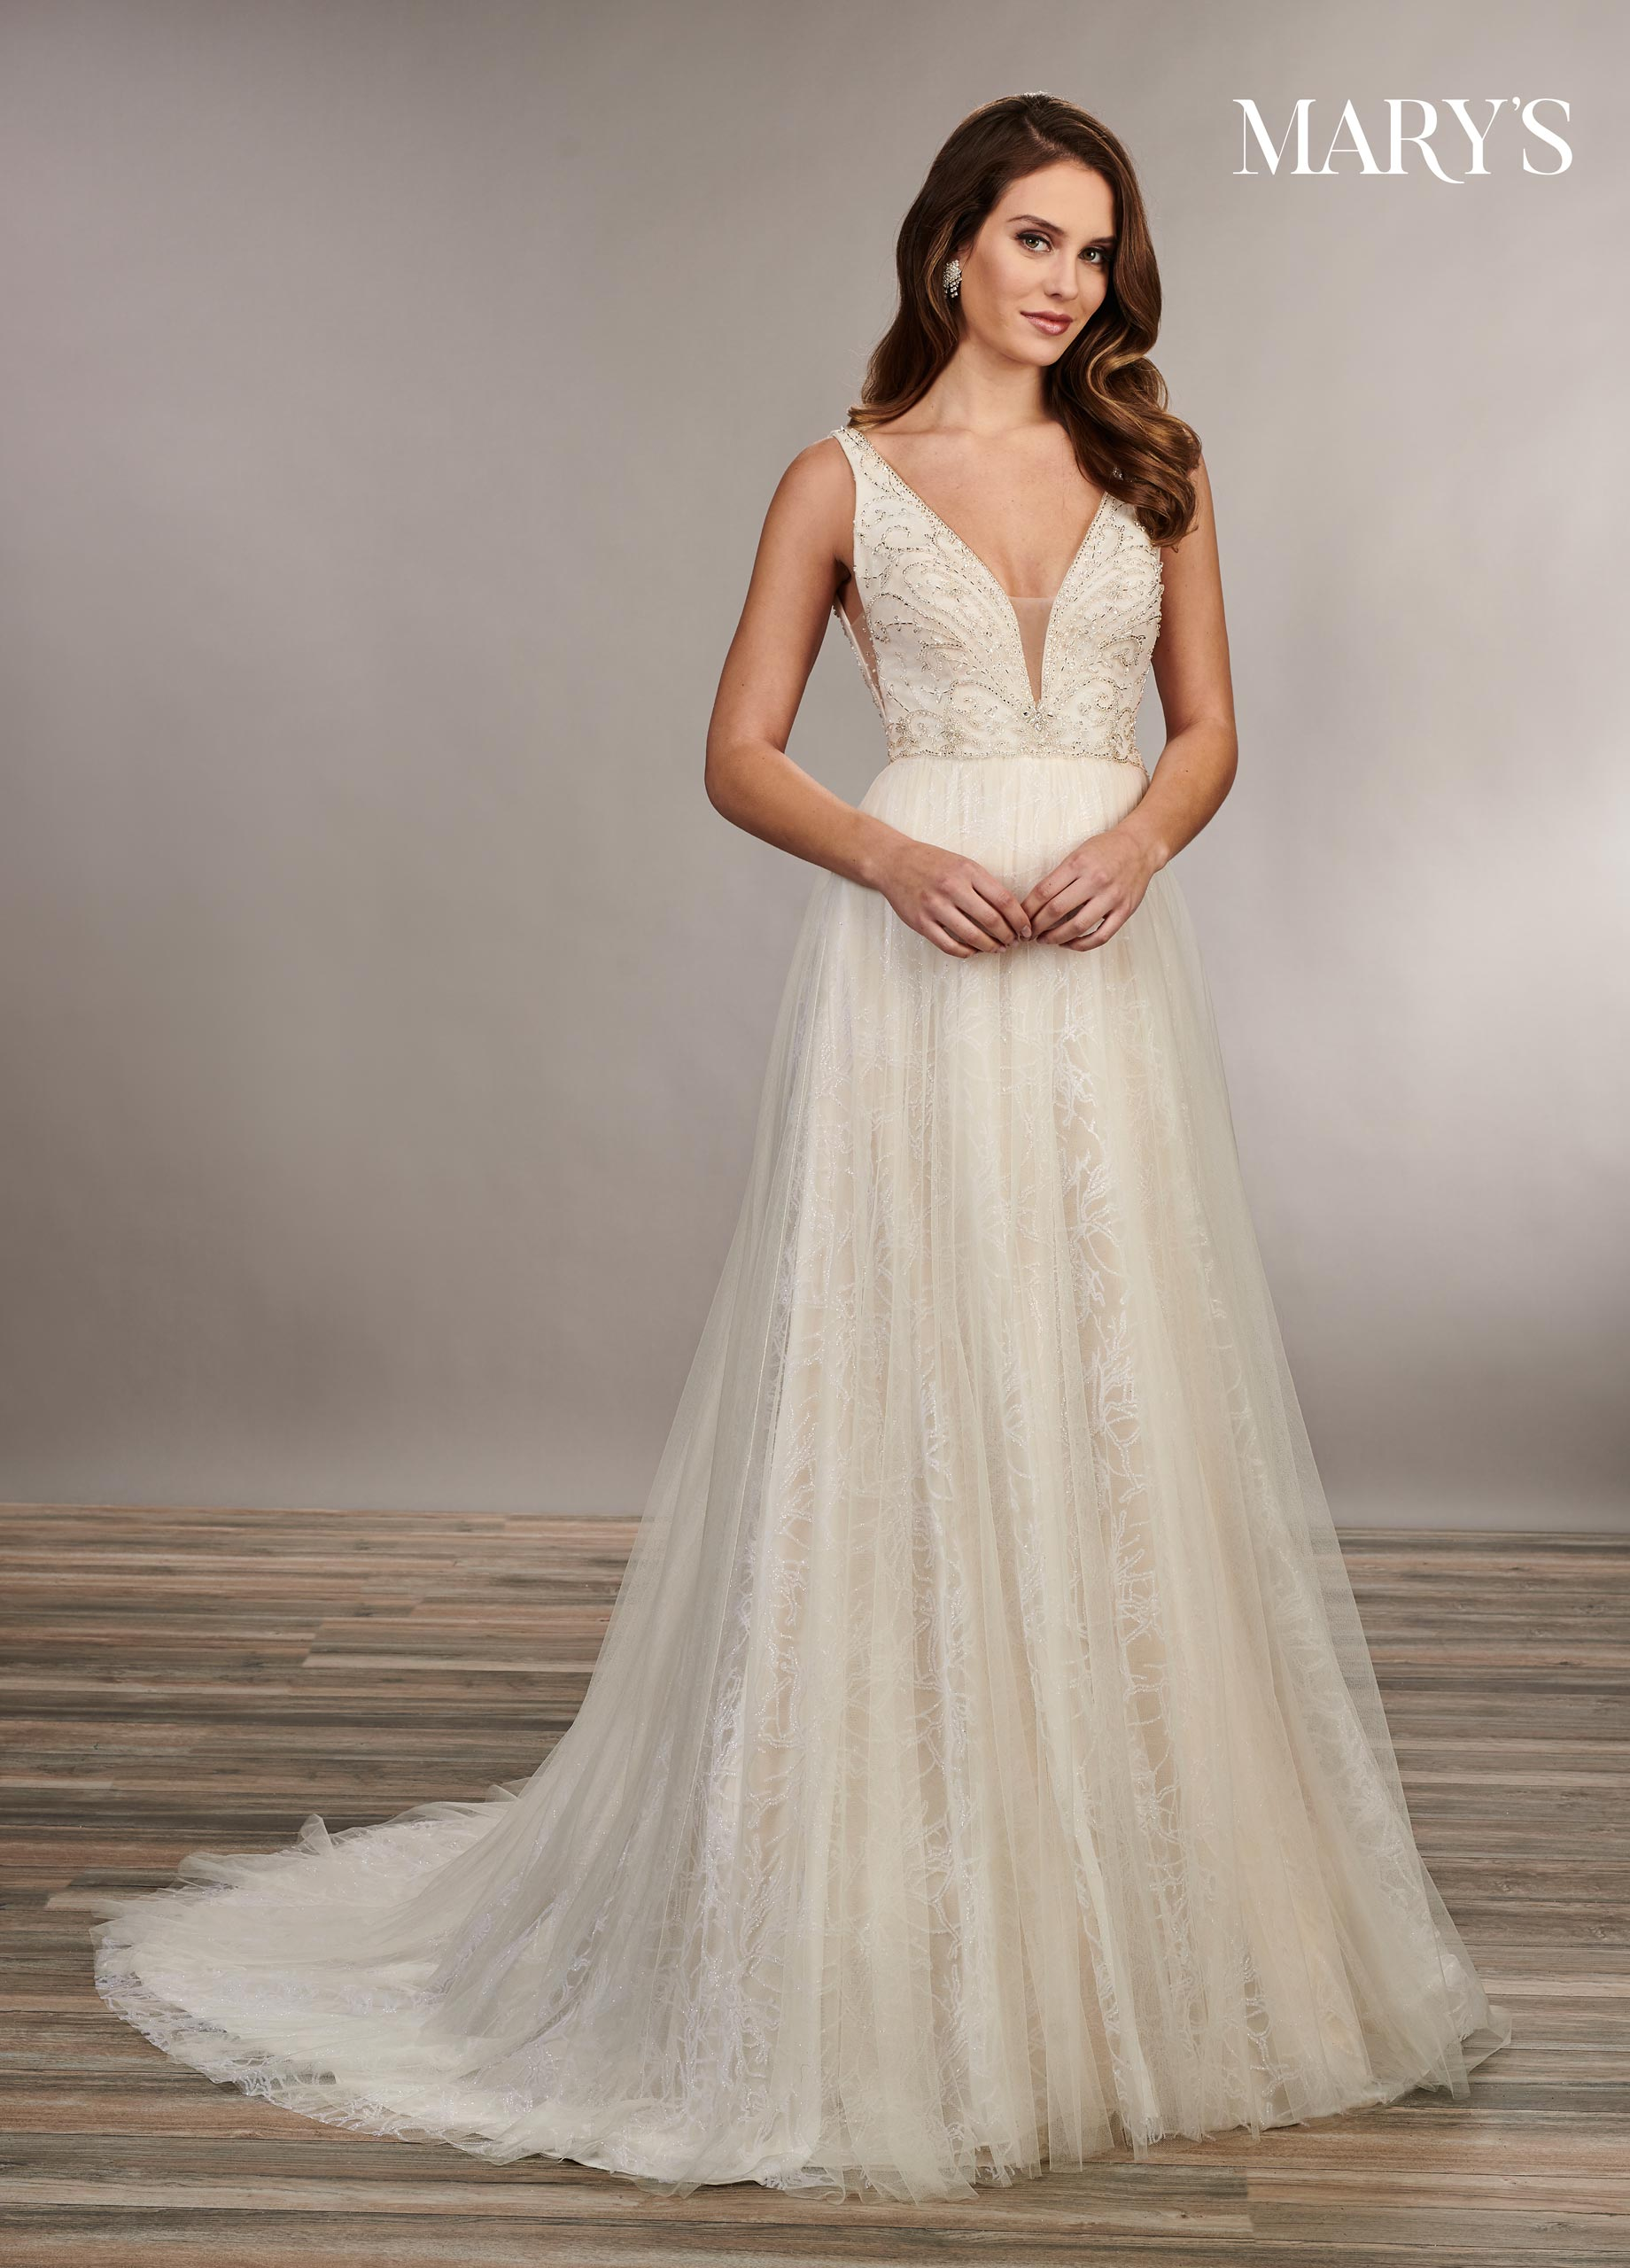 Bridal Wedding Dresses | Mary's | Style - MB3085